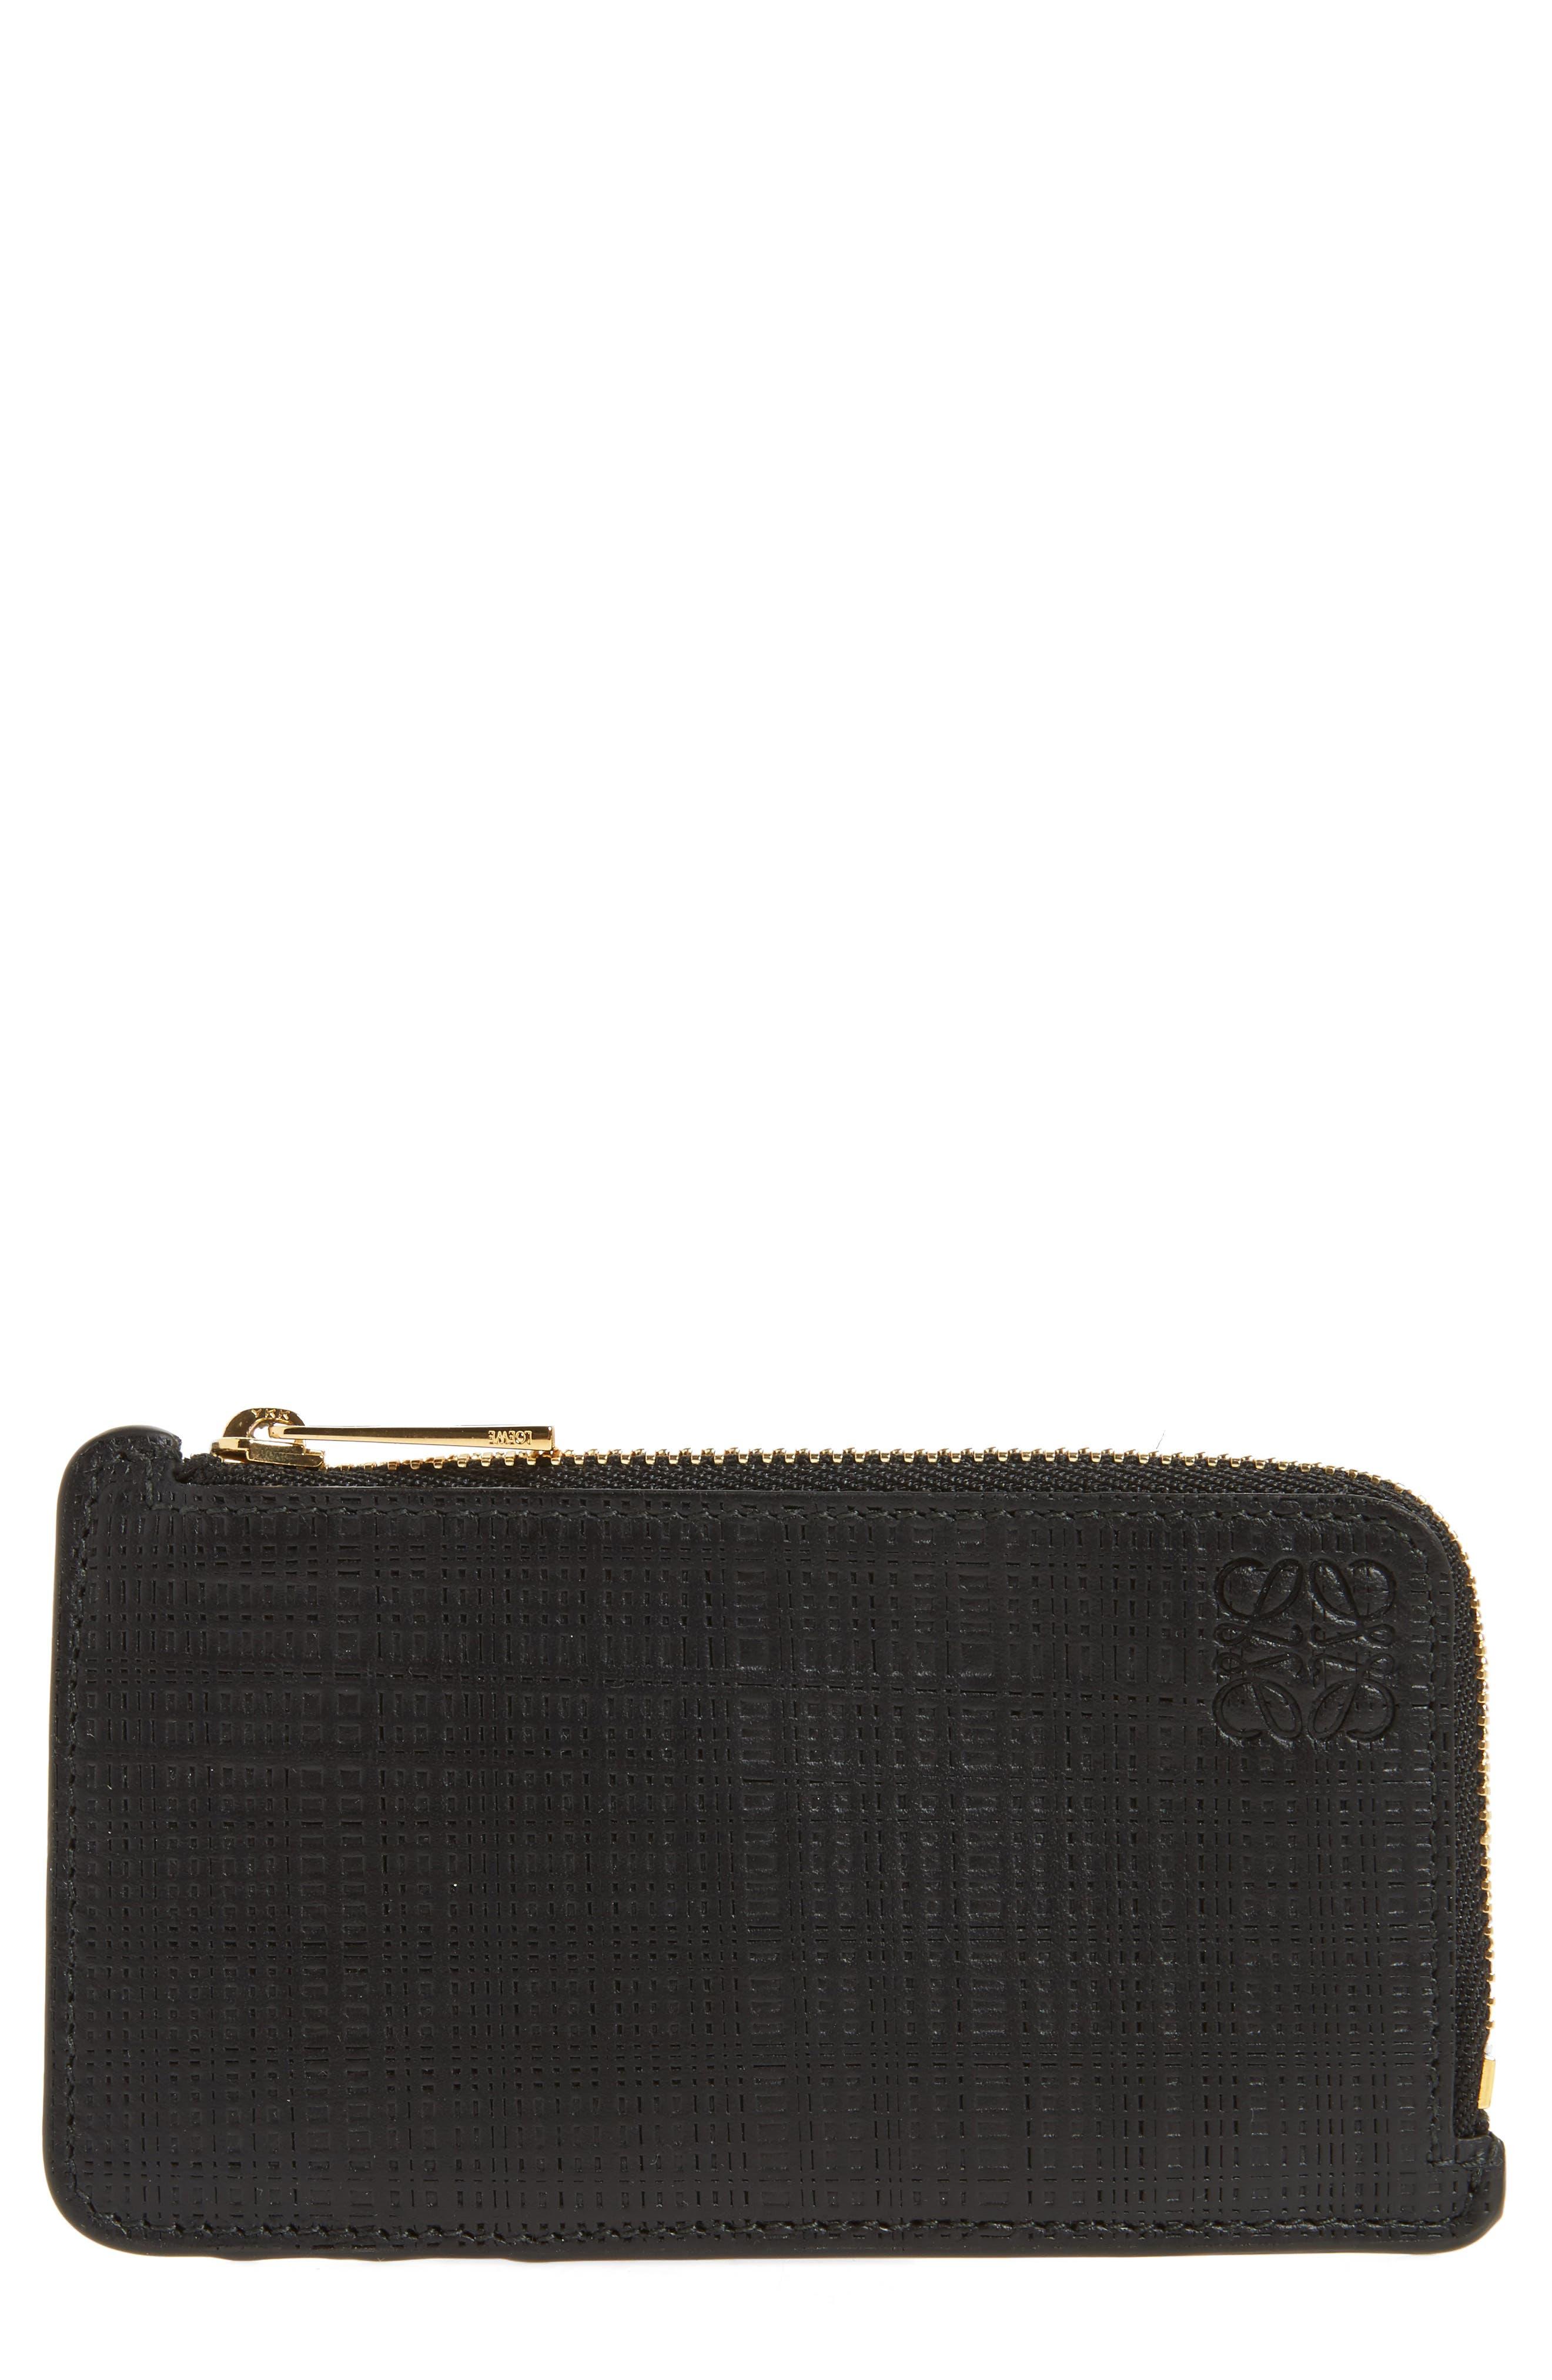 Calfskin Leather Zip Wallet,                             Main thumbnail 1, color,                             001